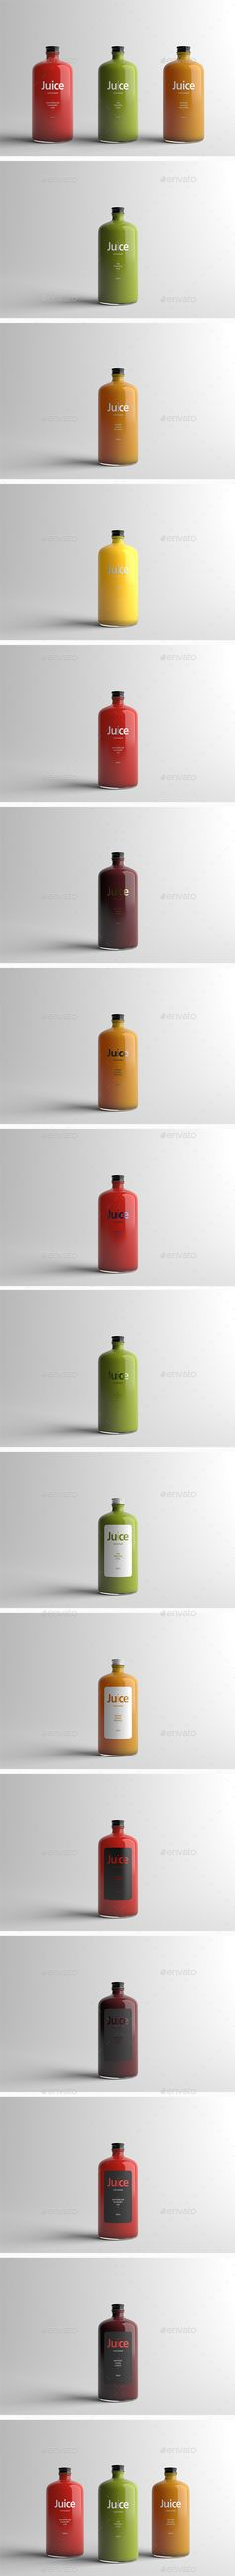 "Juice Bottle Packaging Mock-Up. Download here: <a href=""http://graphicriver.net/item/juice-bottle-packaging-mockup/15336098?ref=ksioks"" rel=""nofollow"" target=""_blank"">graphicriver.net/...</a>"